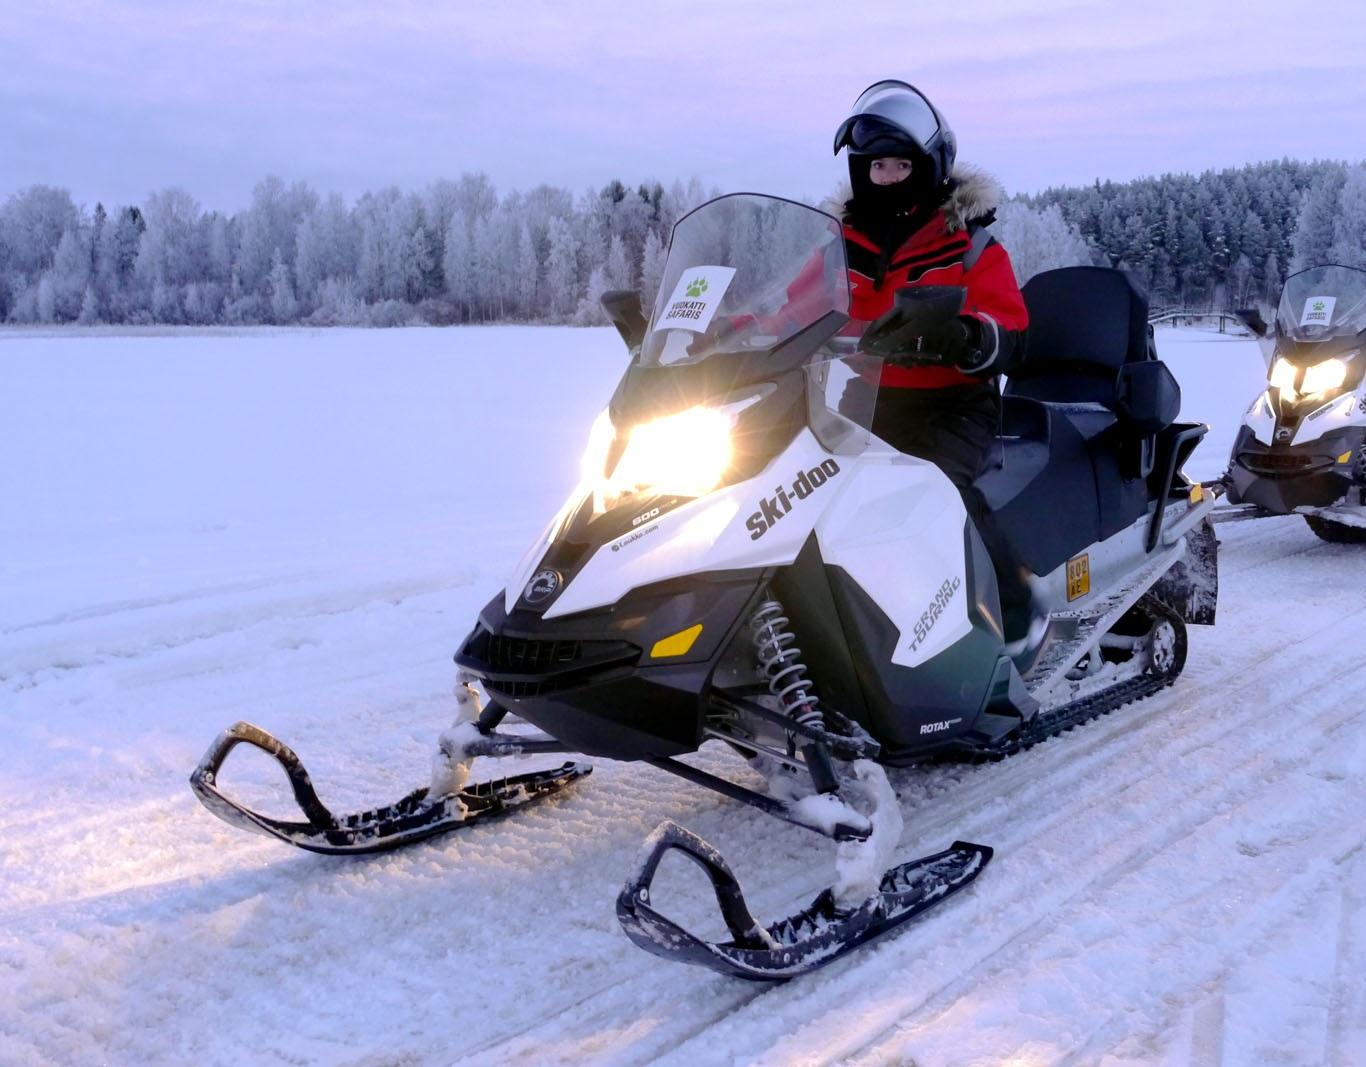 vuokatti-finnland-winter-schneemobil tour-snowmobile-2